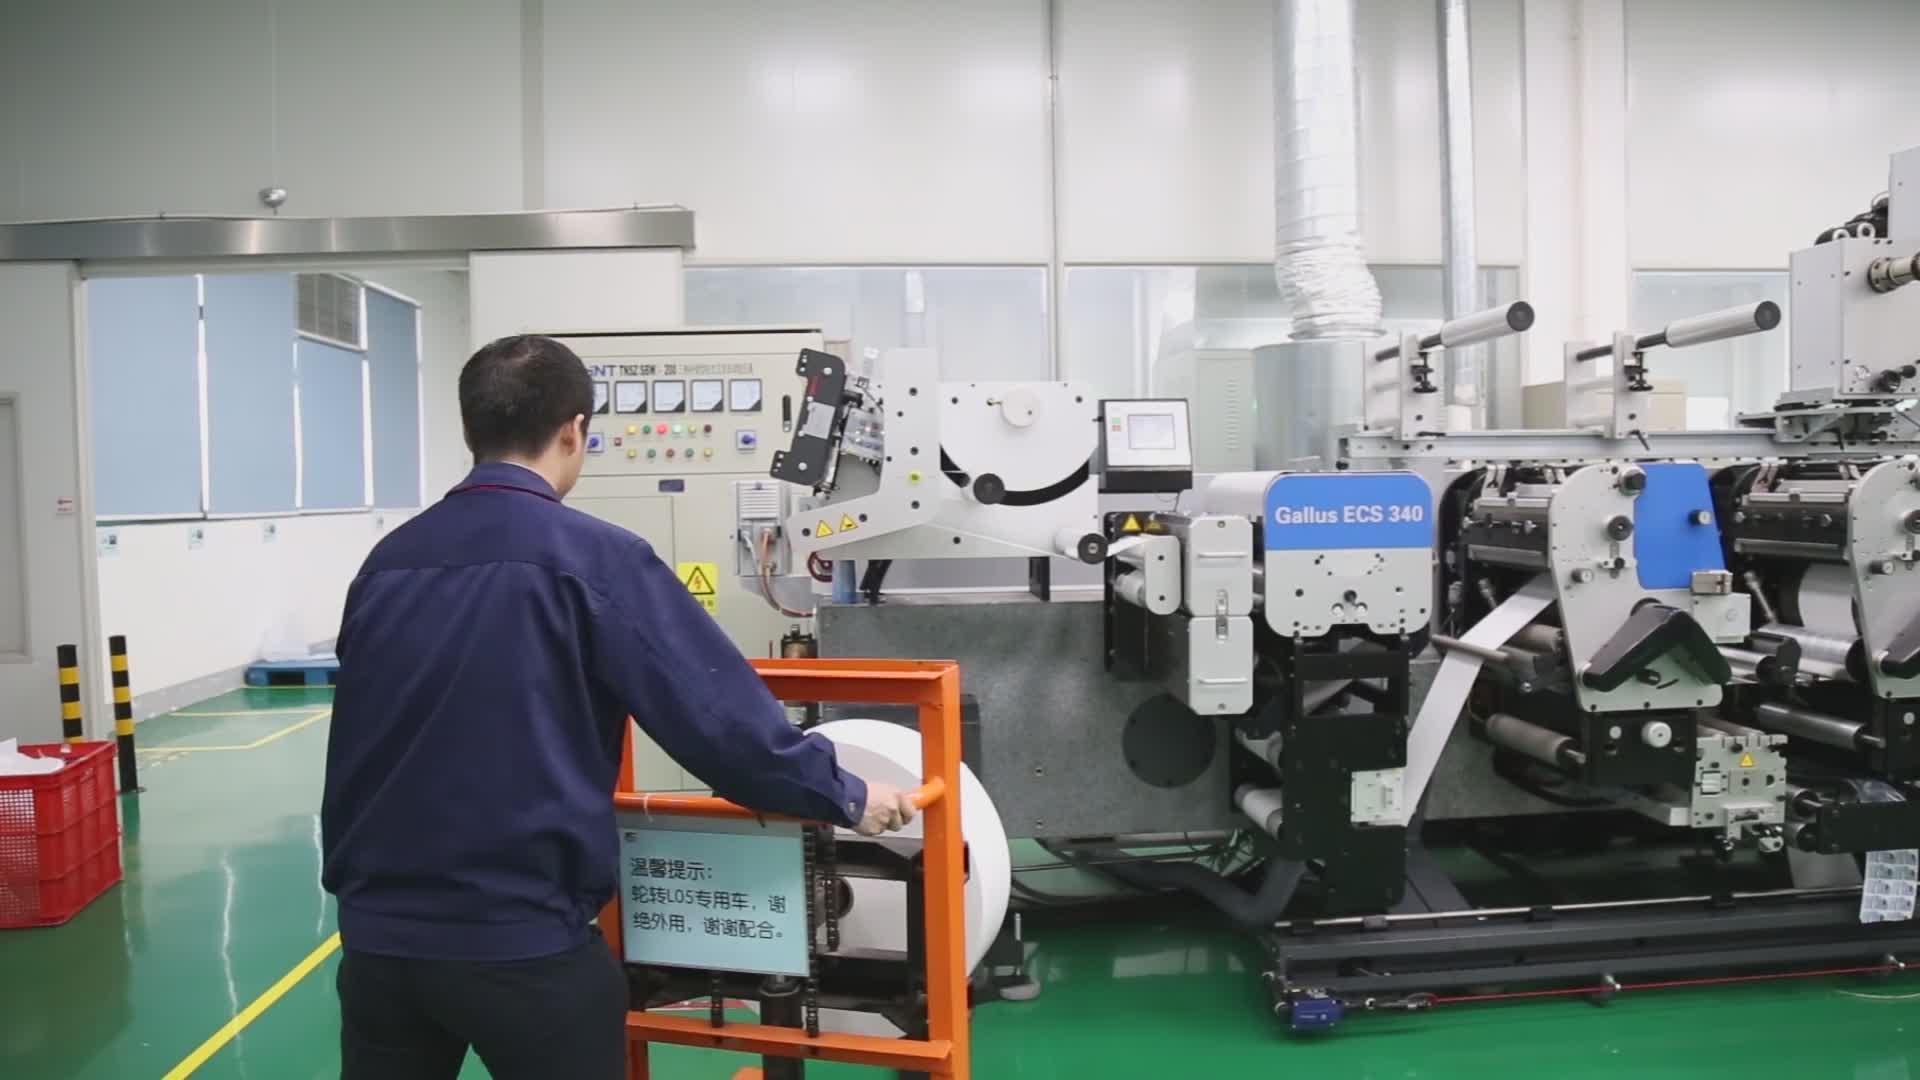 Retângulo branco pp rolo de etiquetas de impressão personalizado eco friendly produto adesivo